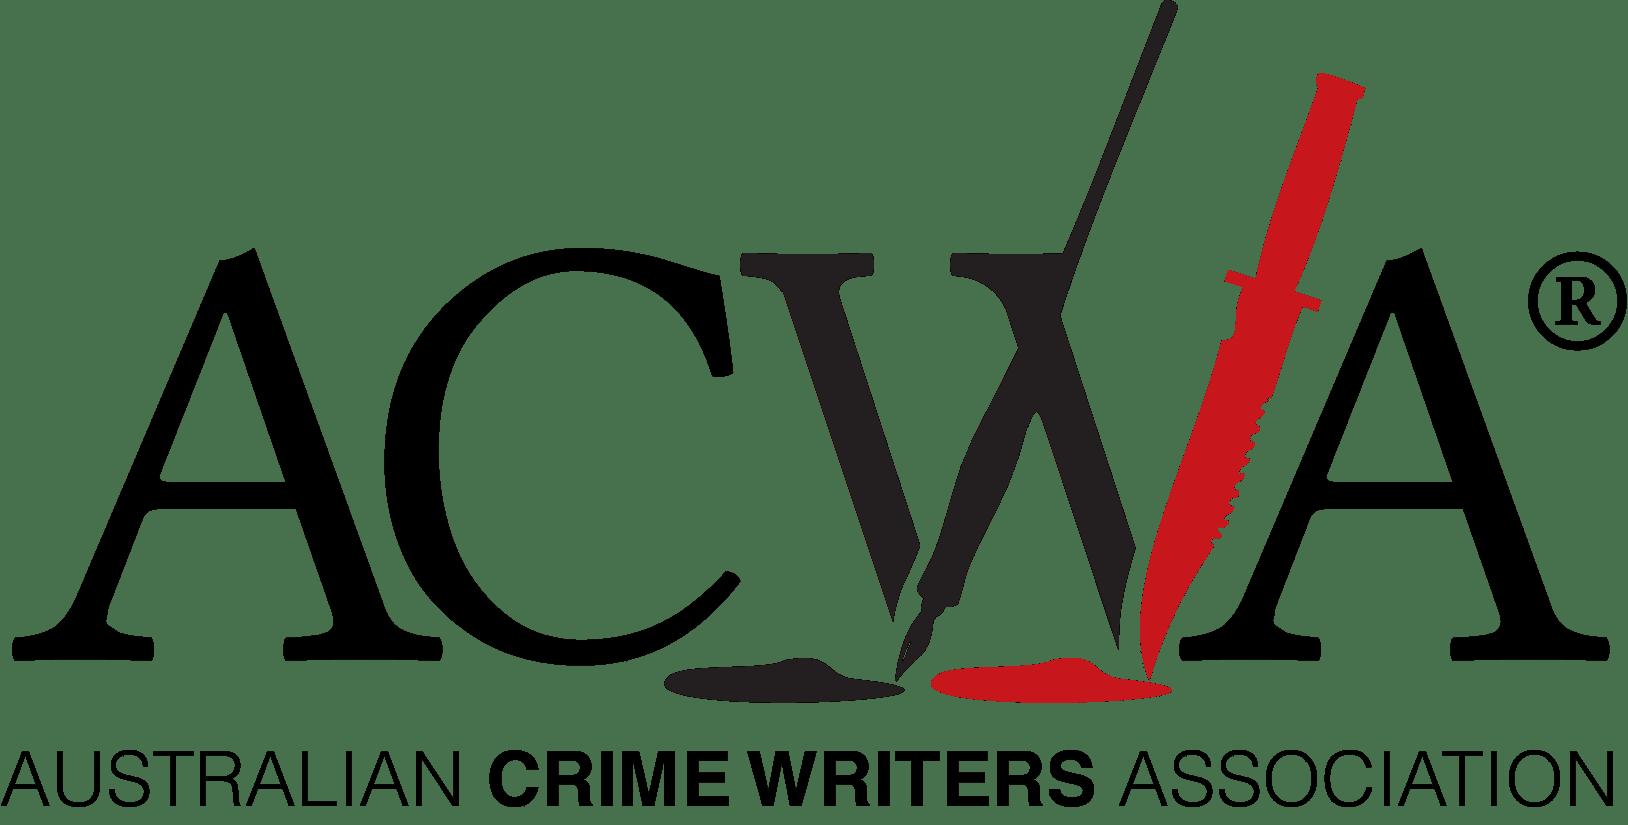 ACWA Logo (Subtext Below) (1)